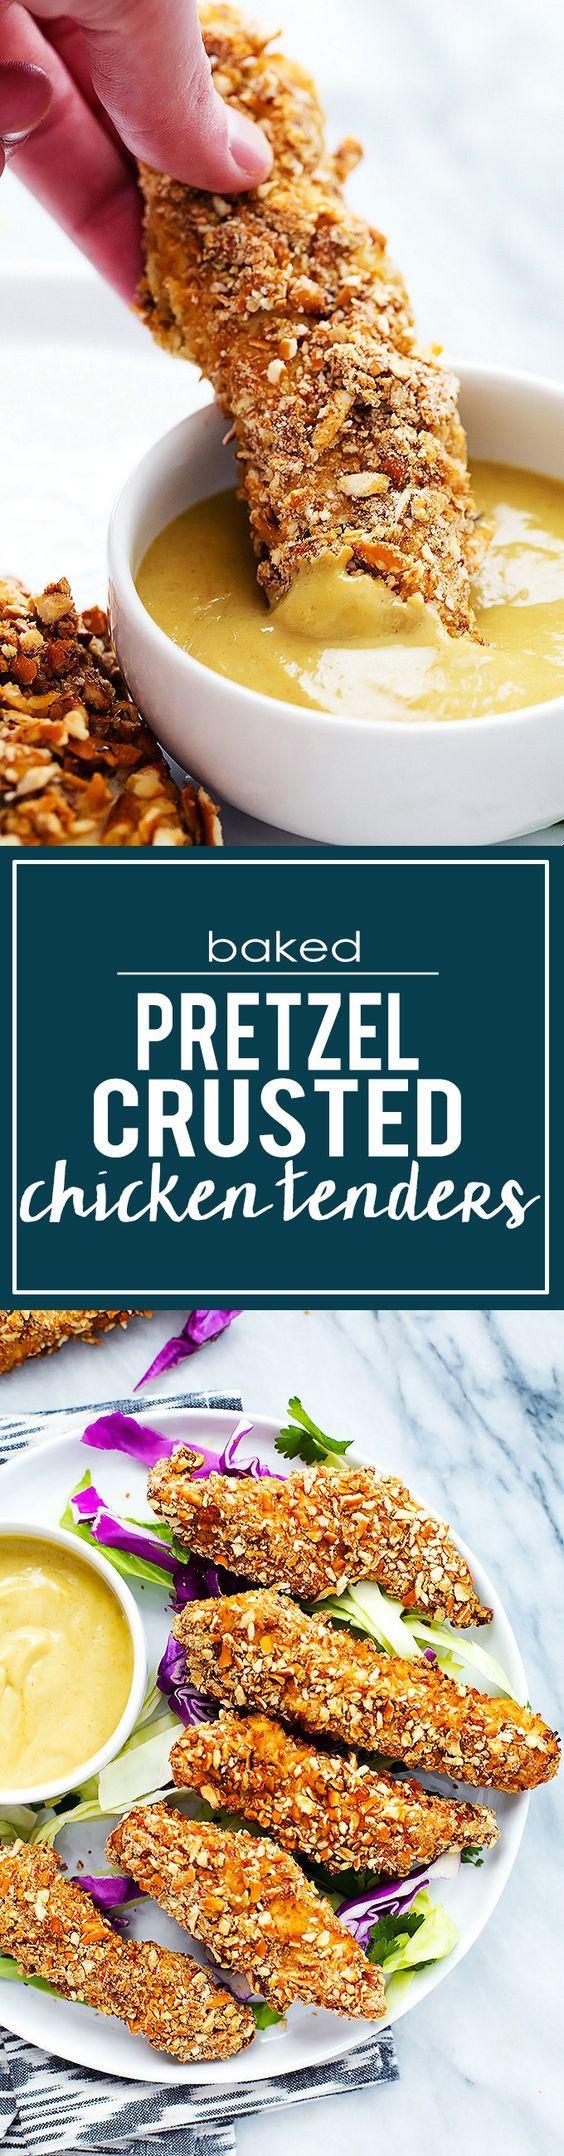 Baked Pretzel Crusted Chicken Tenders |